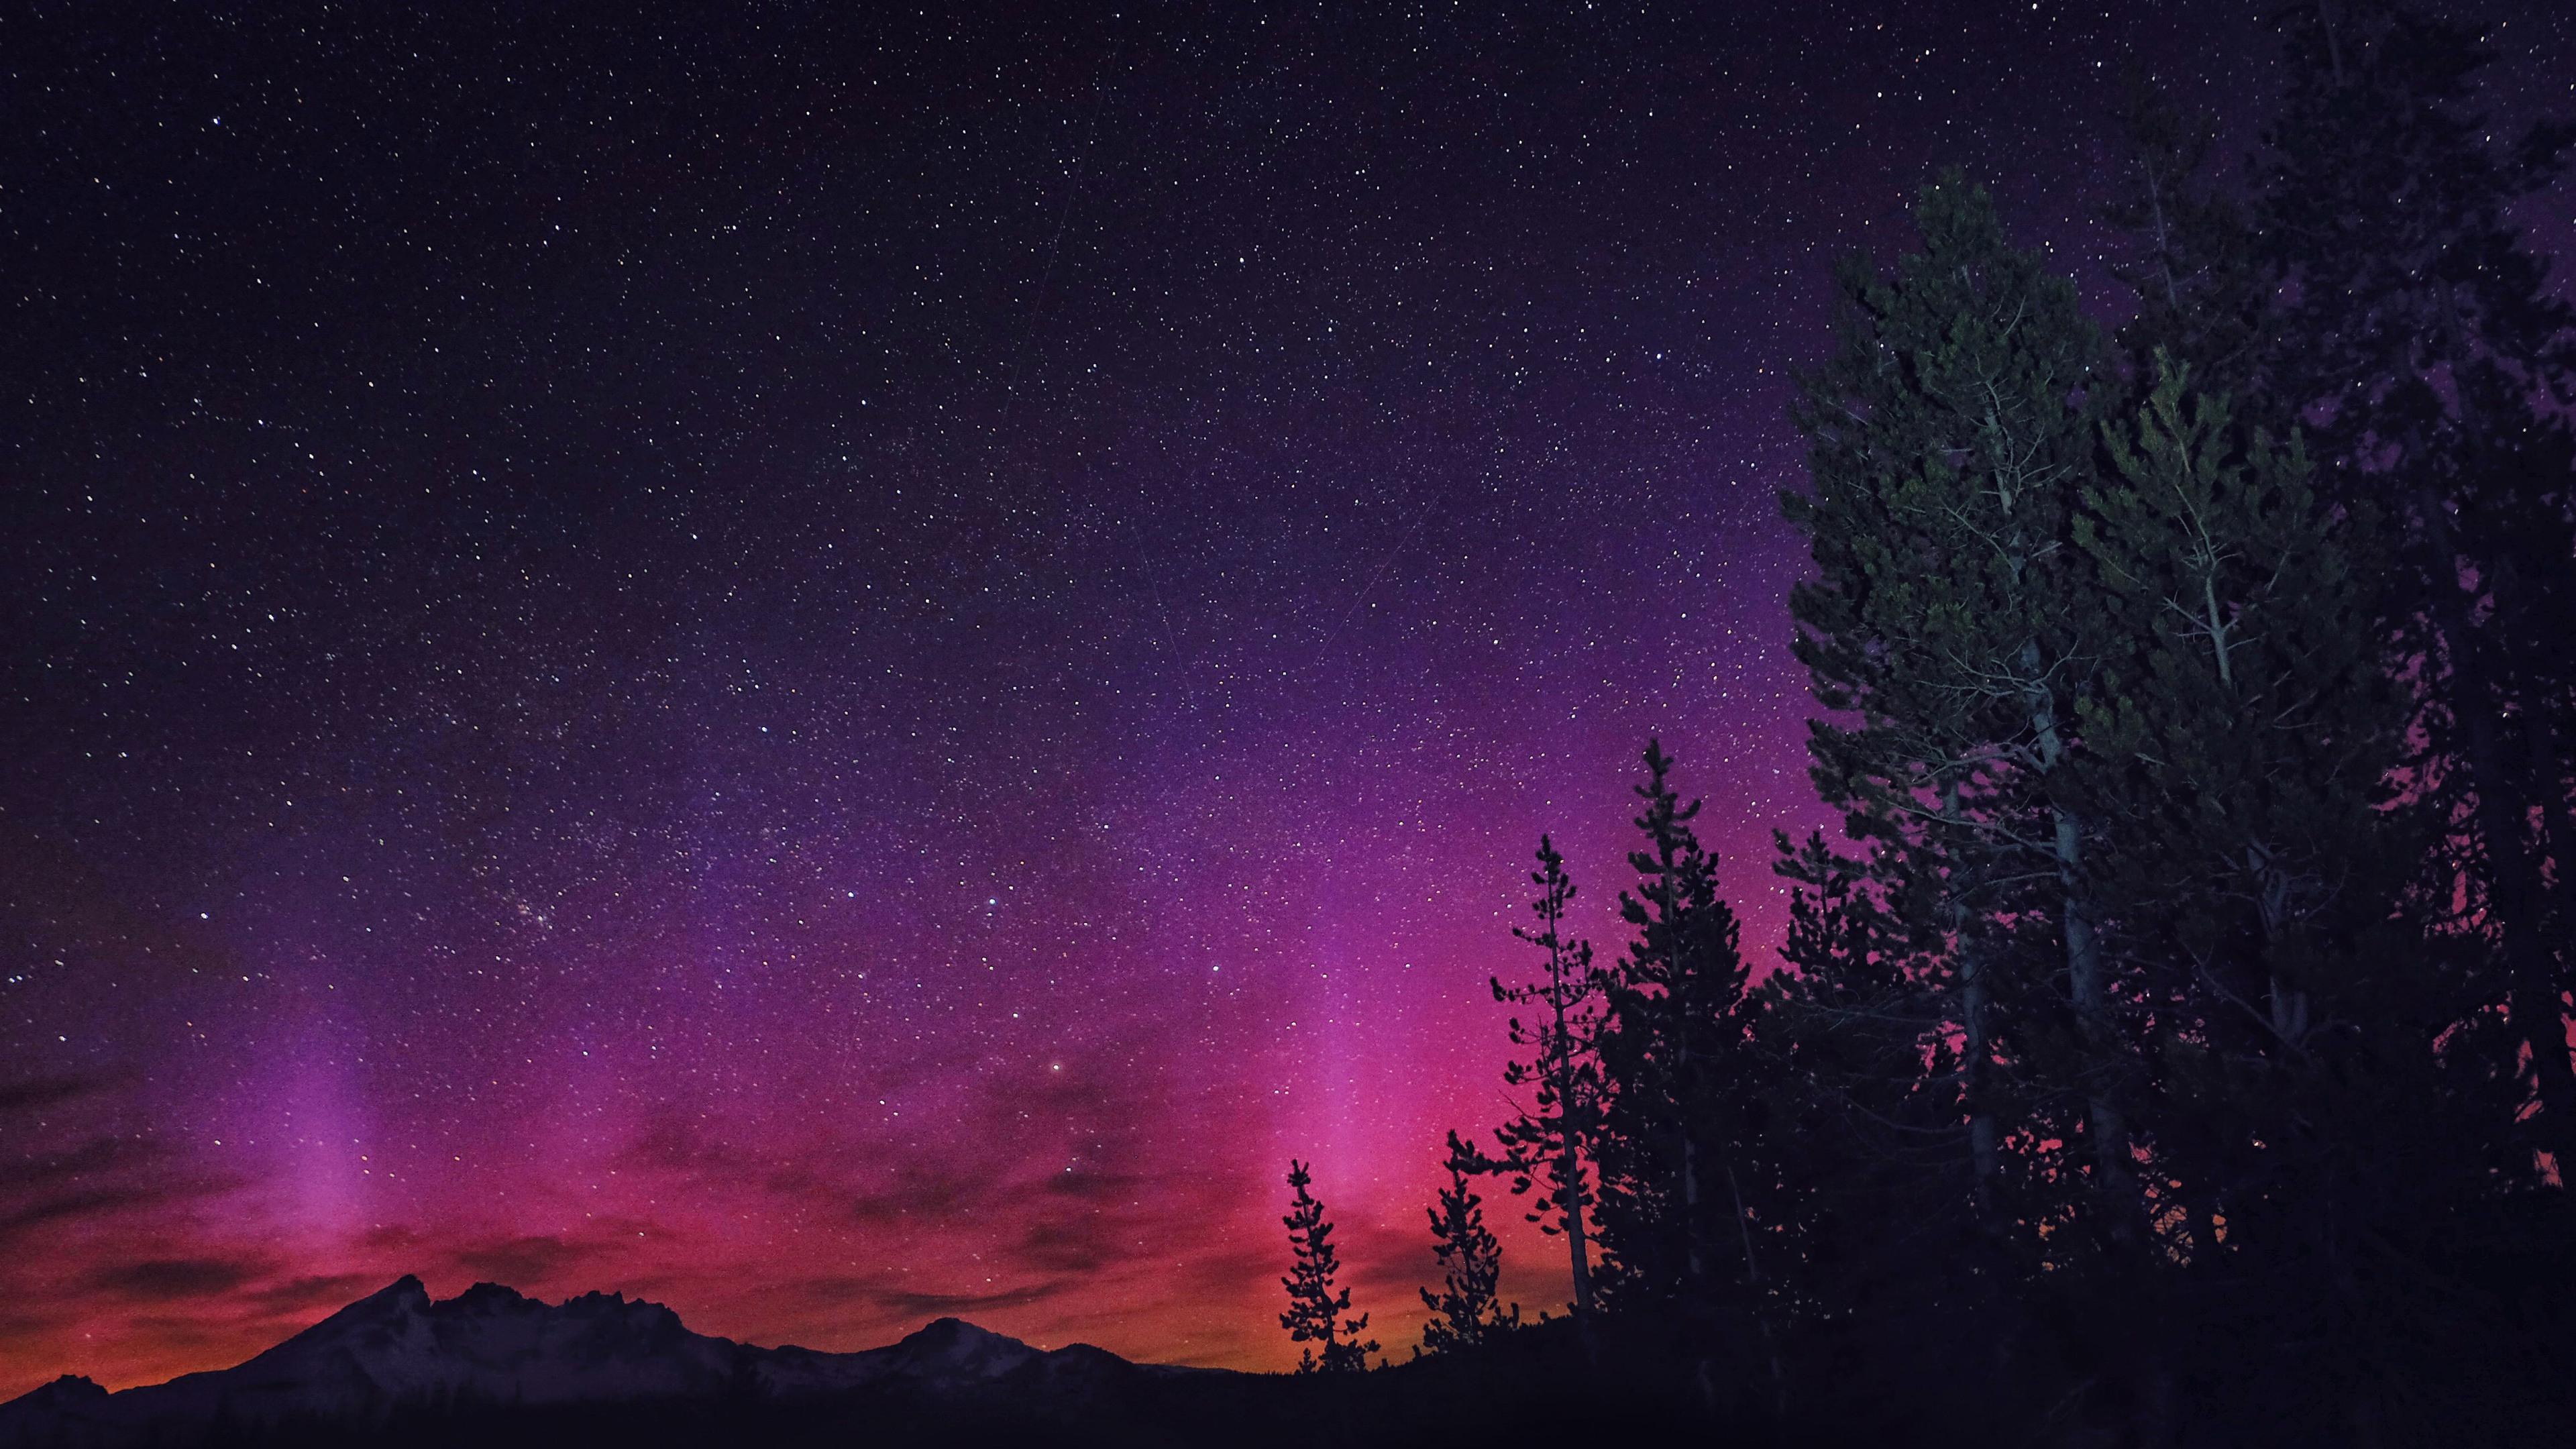 northern lights 4k 1540132880 - Northern Lights 4k - stars wallpapers, sky wallpapers, photography wallpapers, northern lights wallpapers, nature wallpapers, hd-wallpapers, 4k-wallpapers